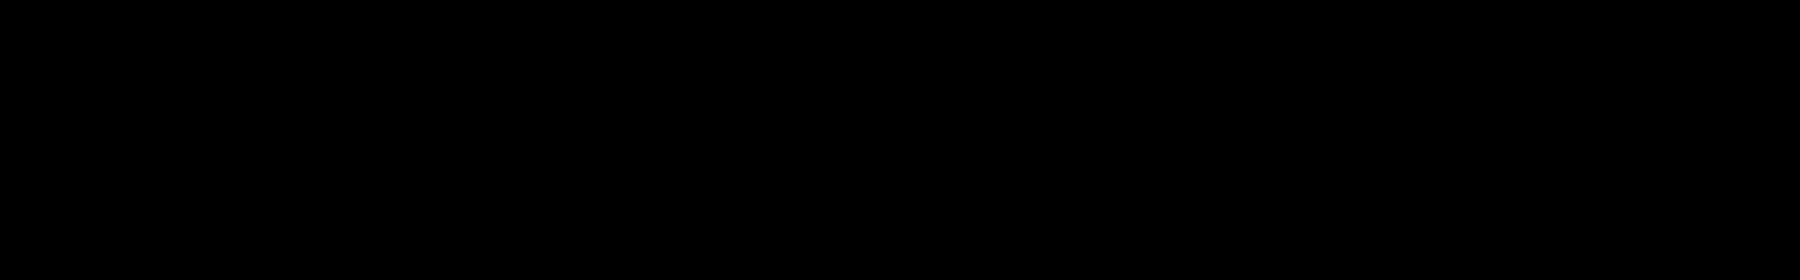 E-motion Padsheaven audio waveform